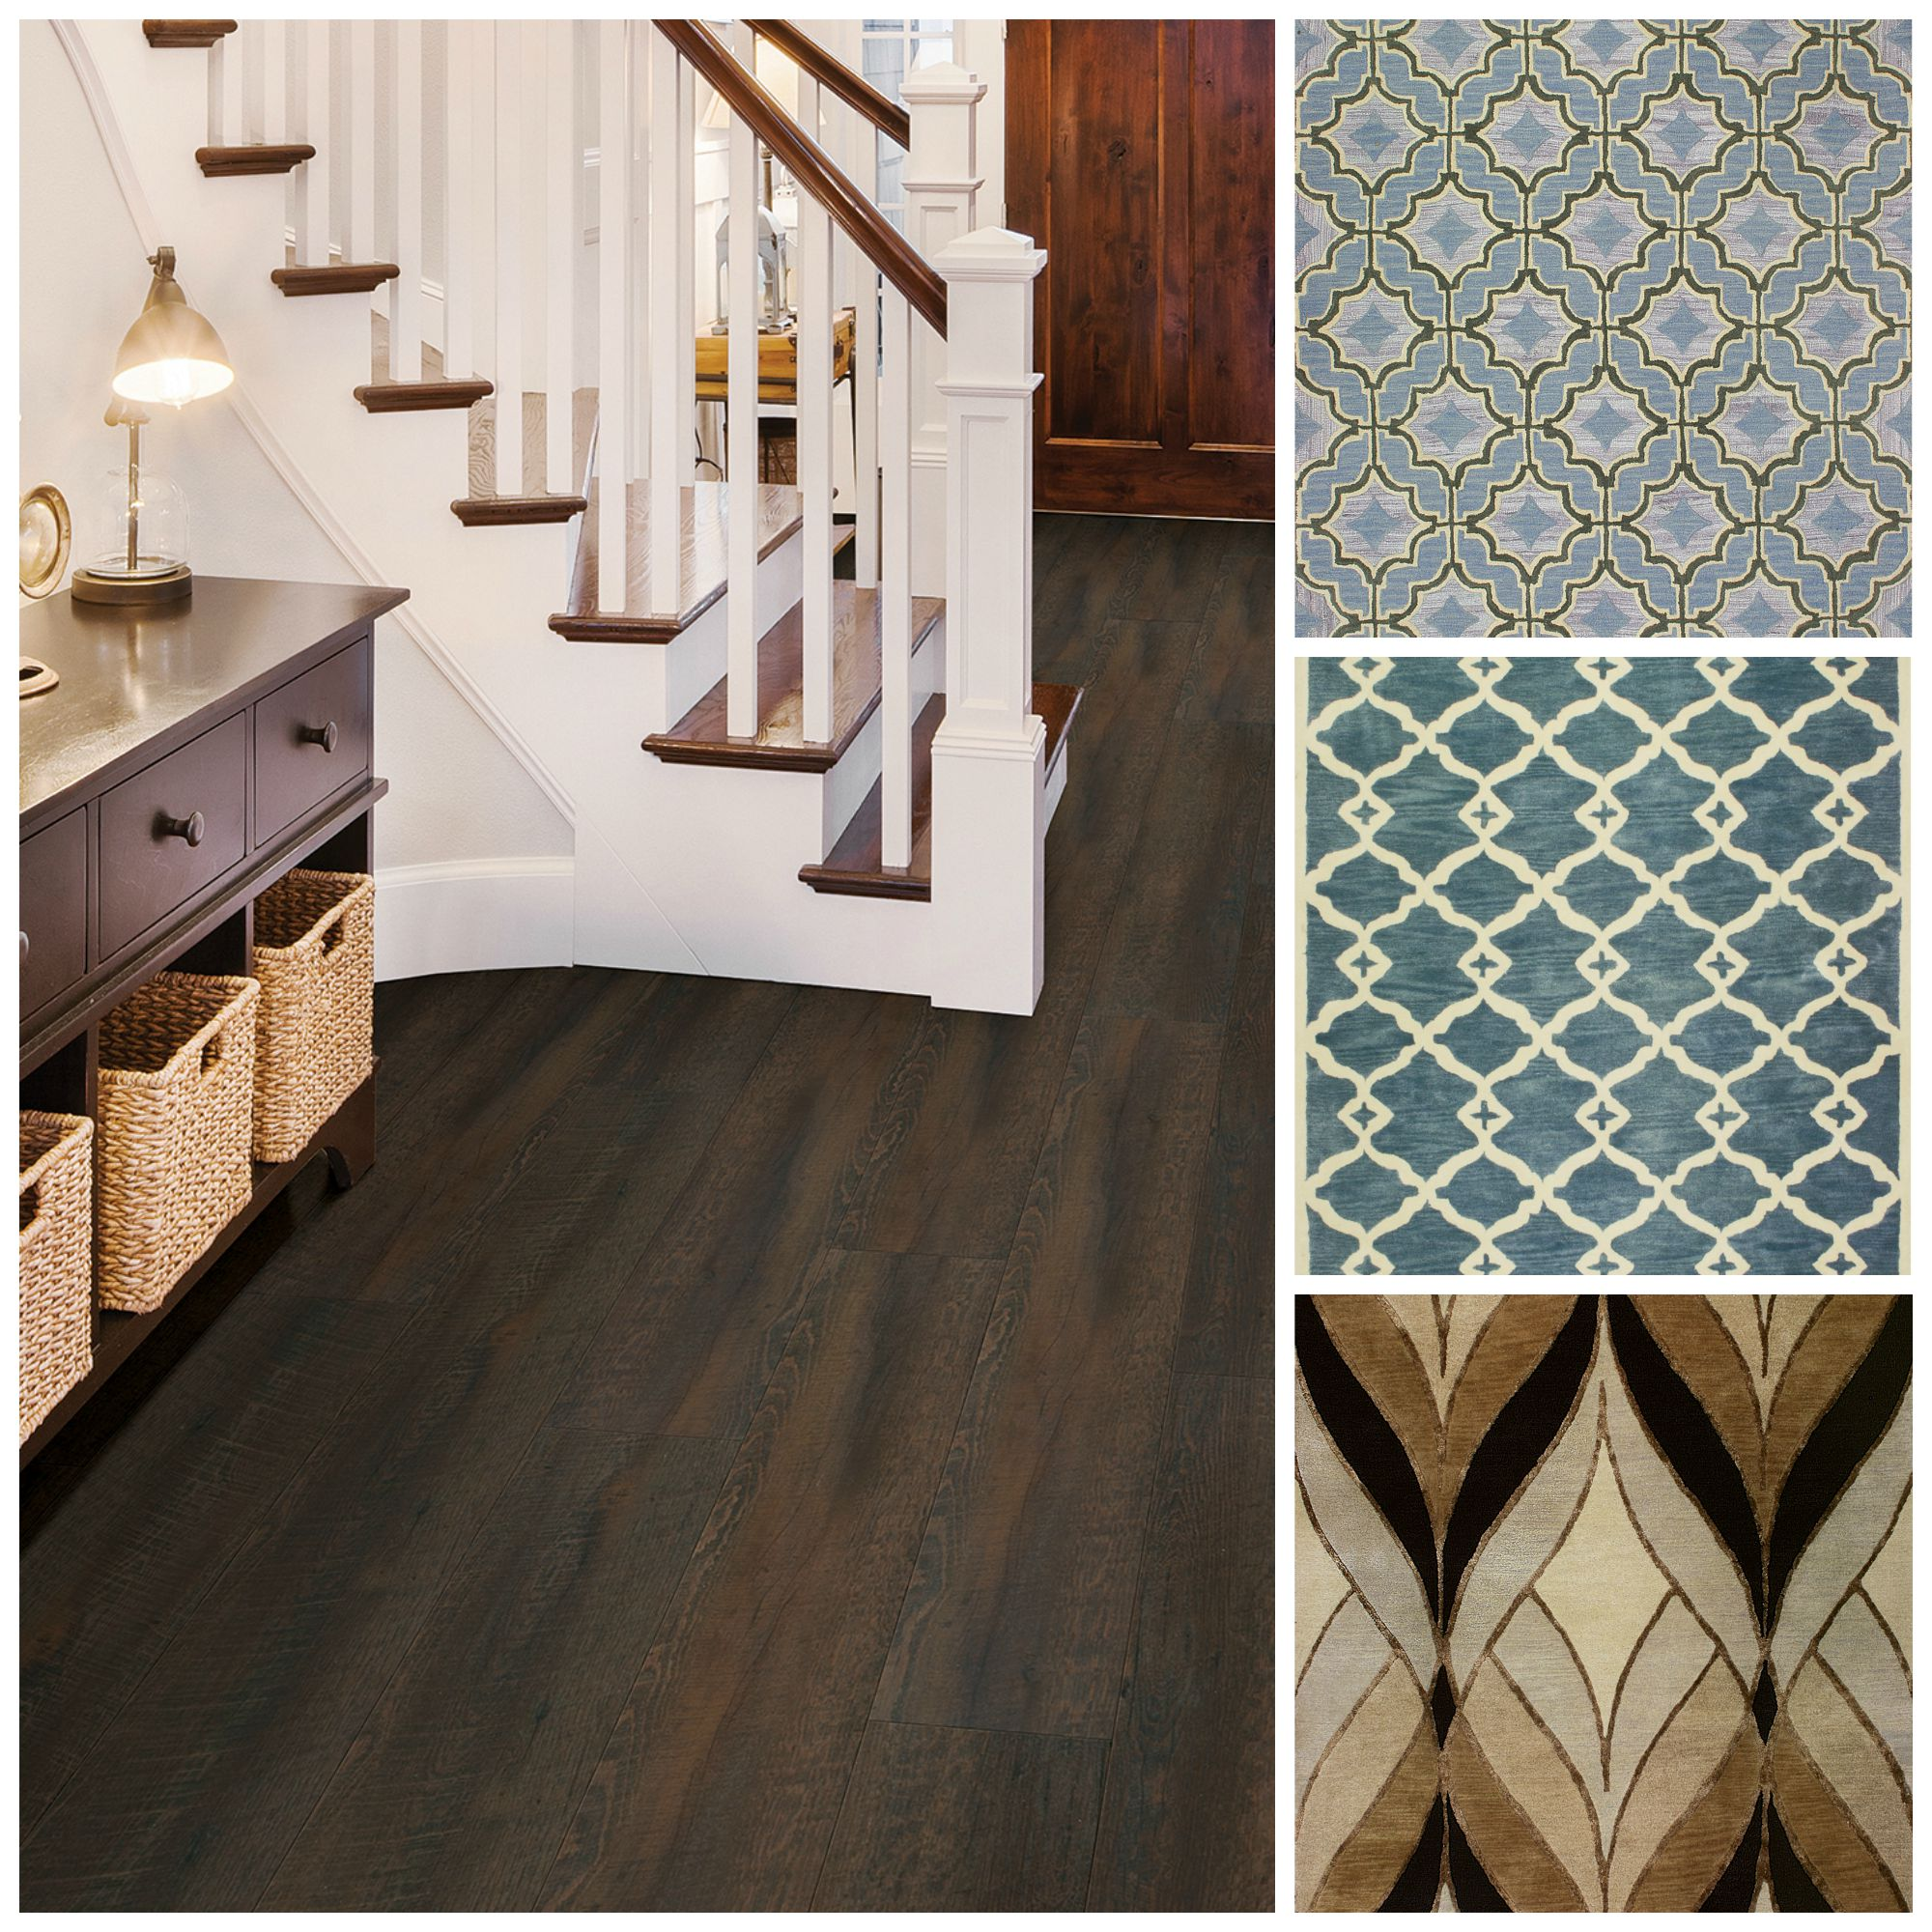 knight s carpets interiors